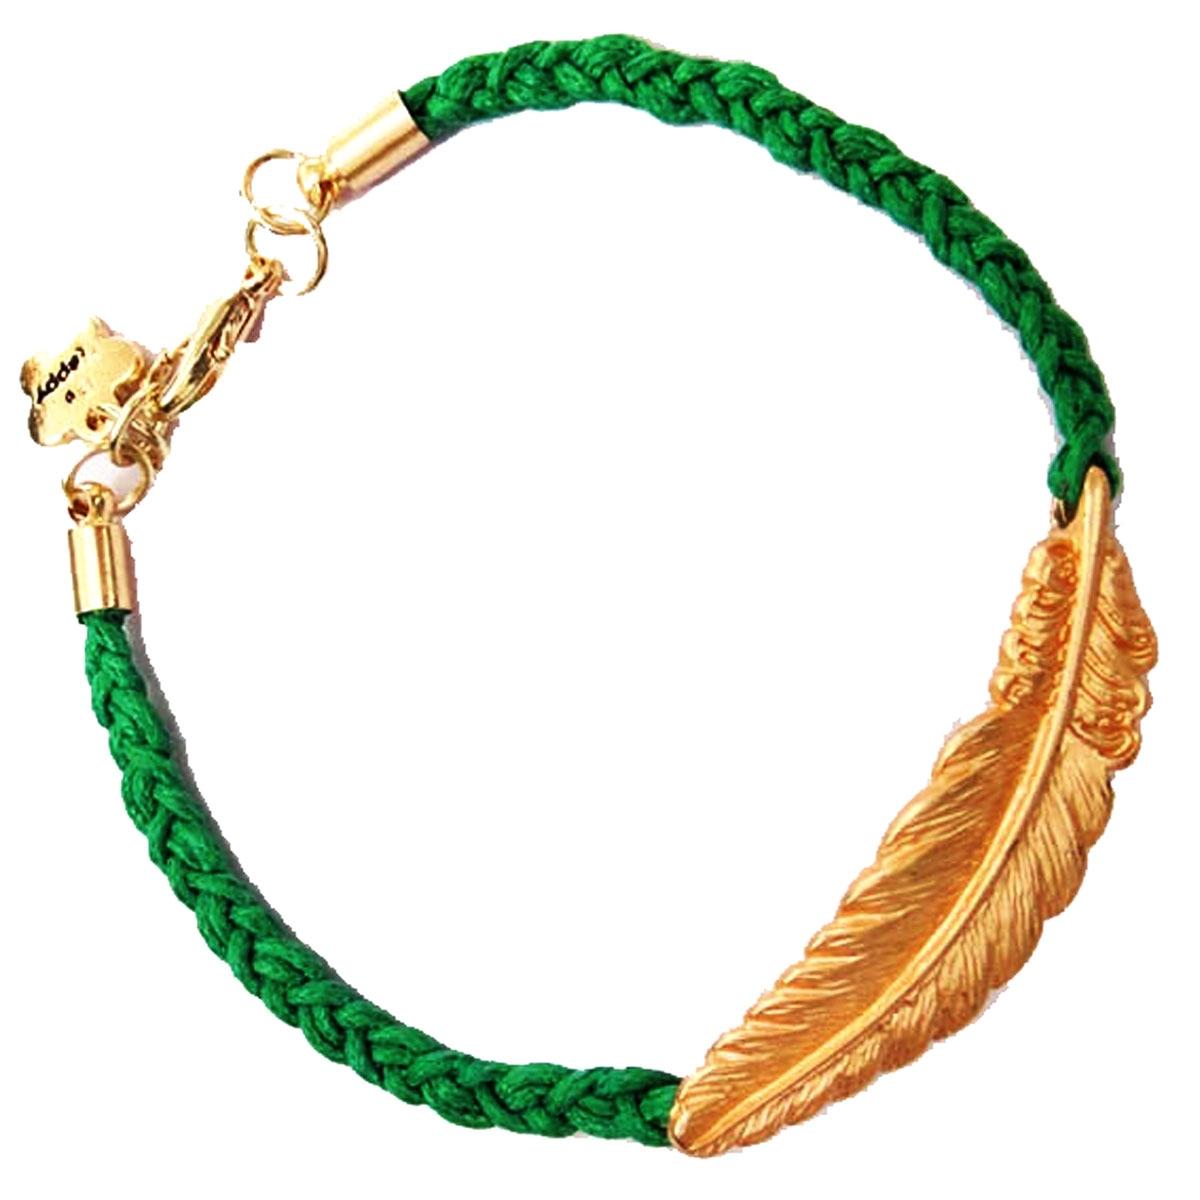 4b9ad8360018b Women Lady Jewelry Gold Tone Feather Leaf Woven Rope Friendship Bracelet  Bangle 2*Green 23mm x 45mm